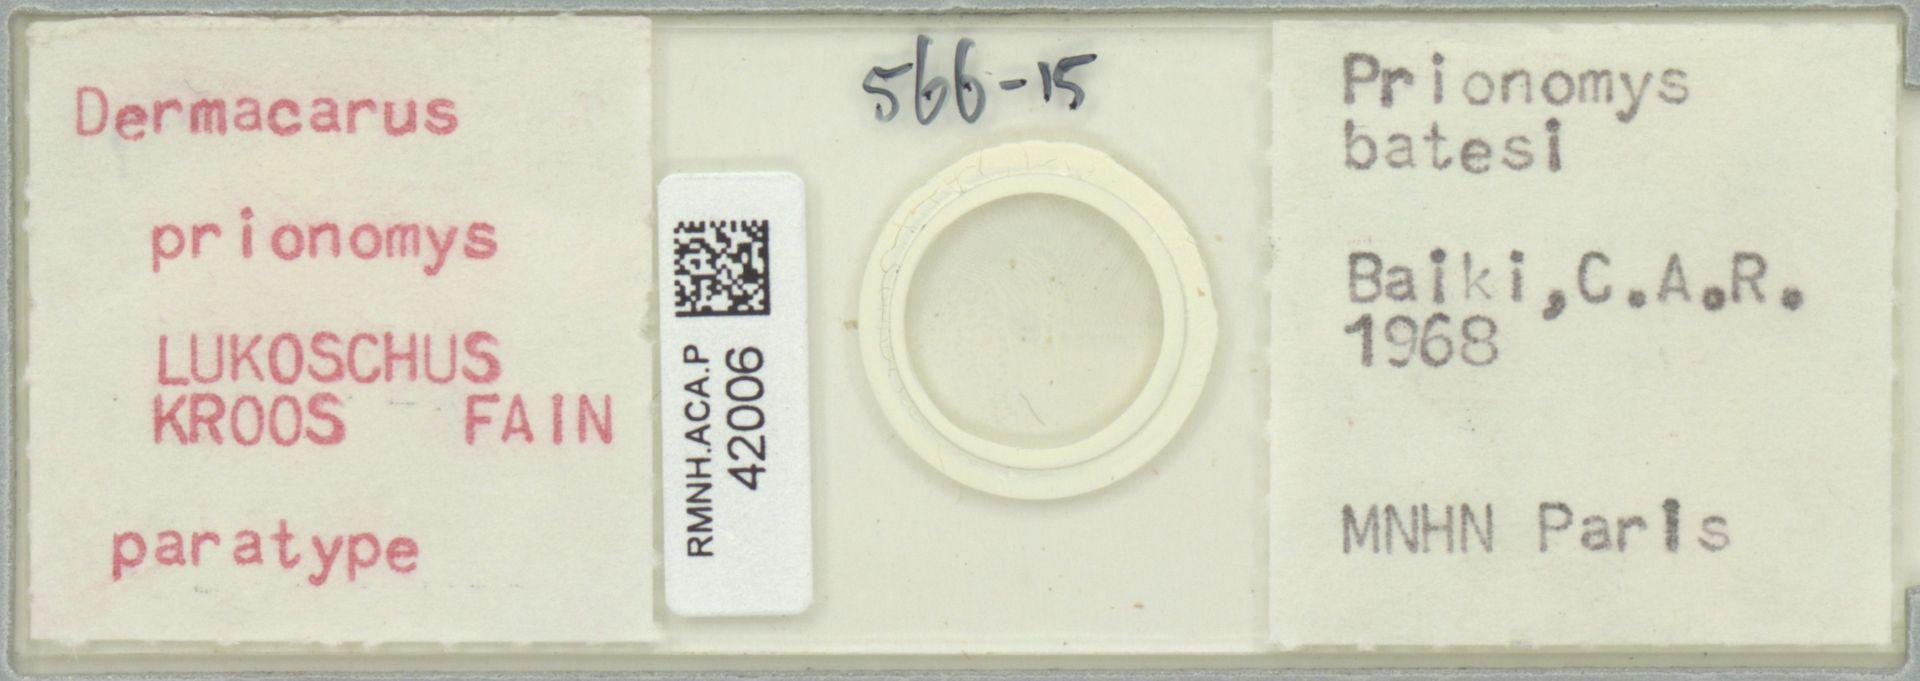 RMNH.ACA.P.42006 | Dermacarus prionomys LUKOSCHUS KROOS FAIN